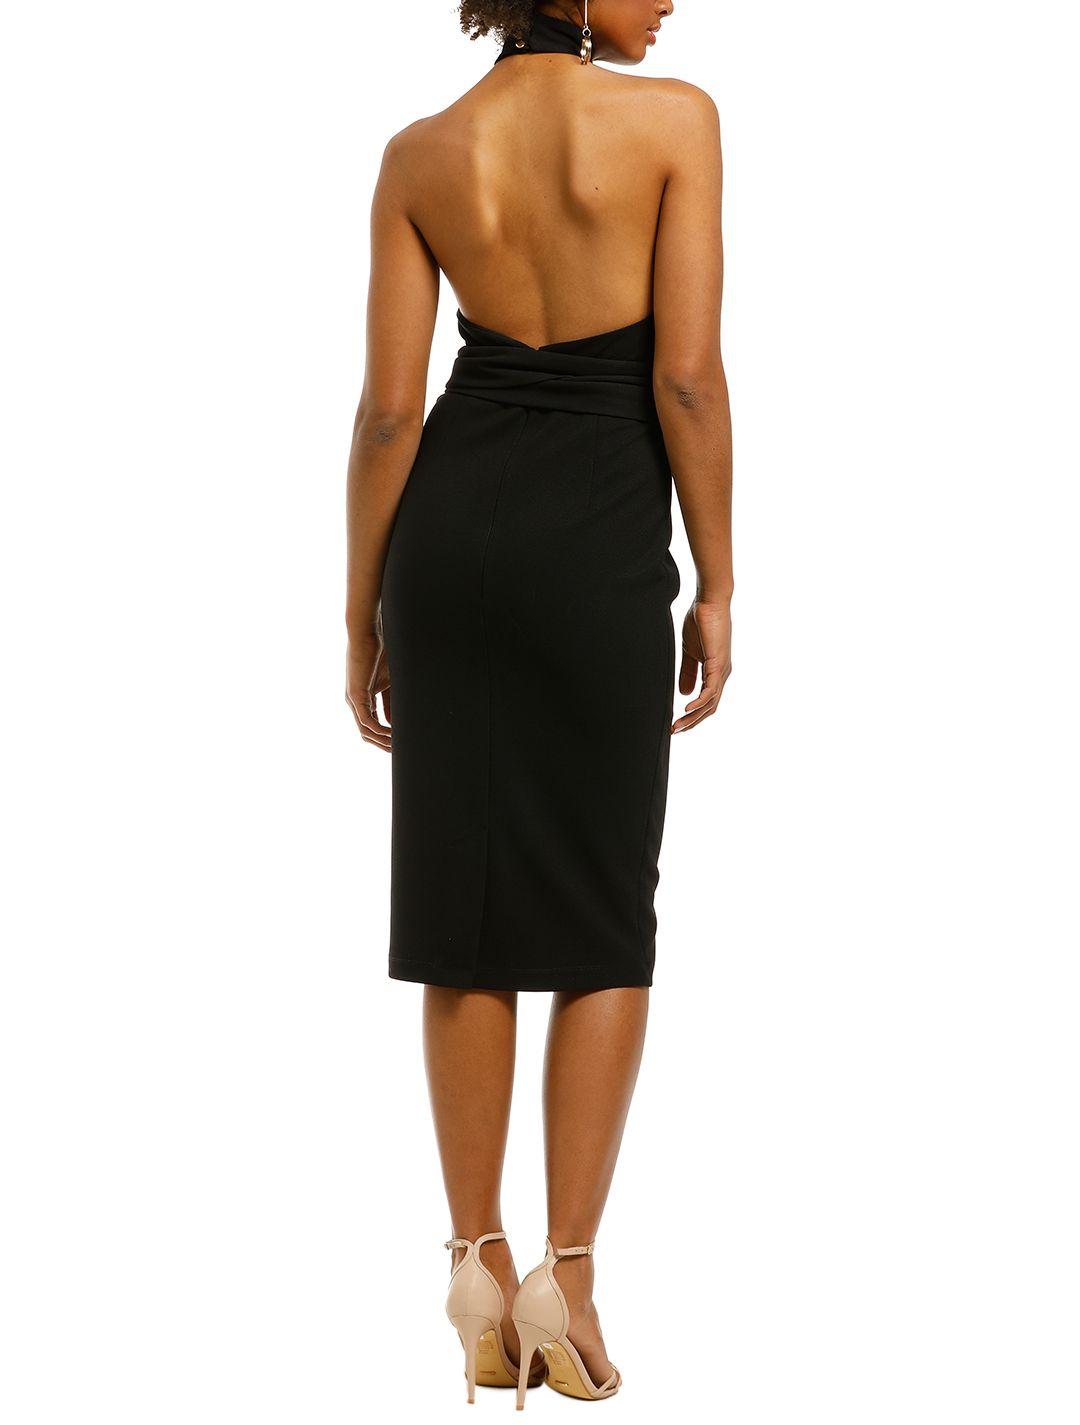 Pasduchas-Aurelia-High-Midi-Dress-Black-Back